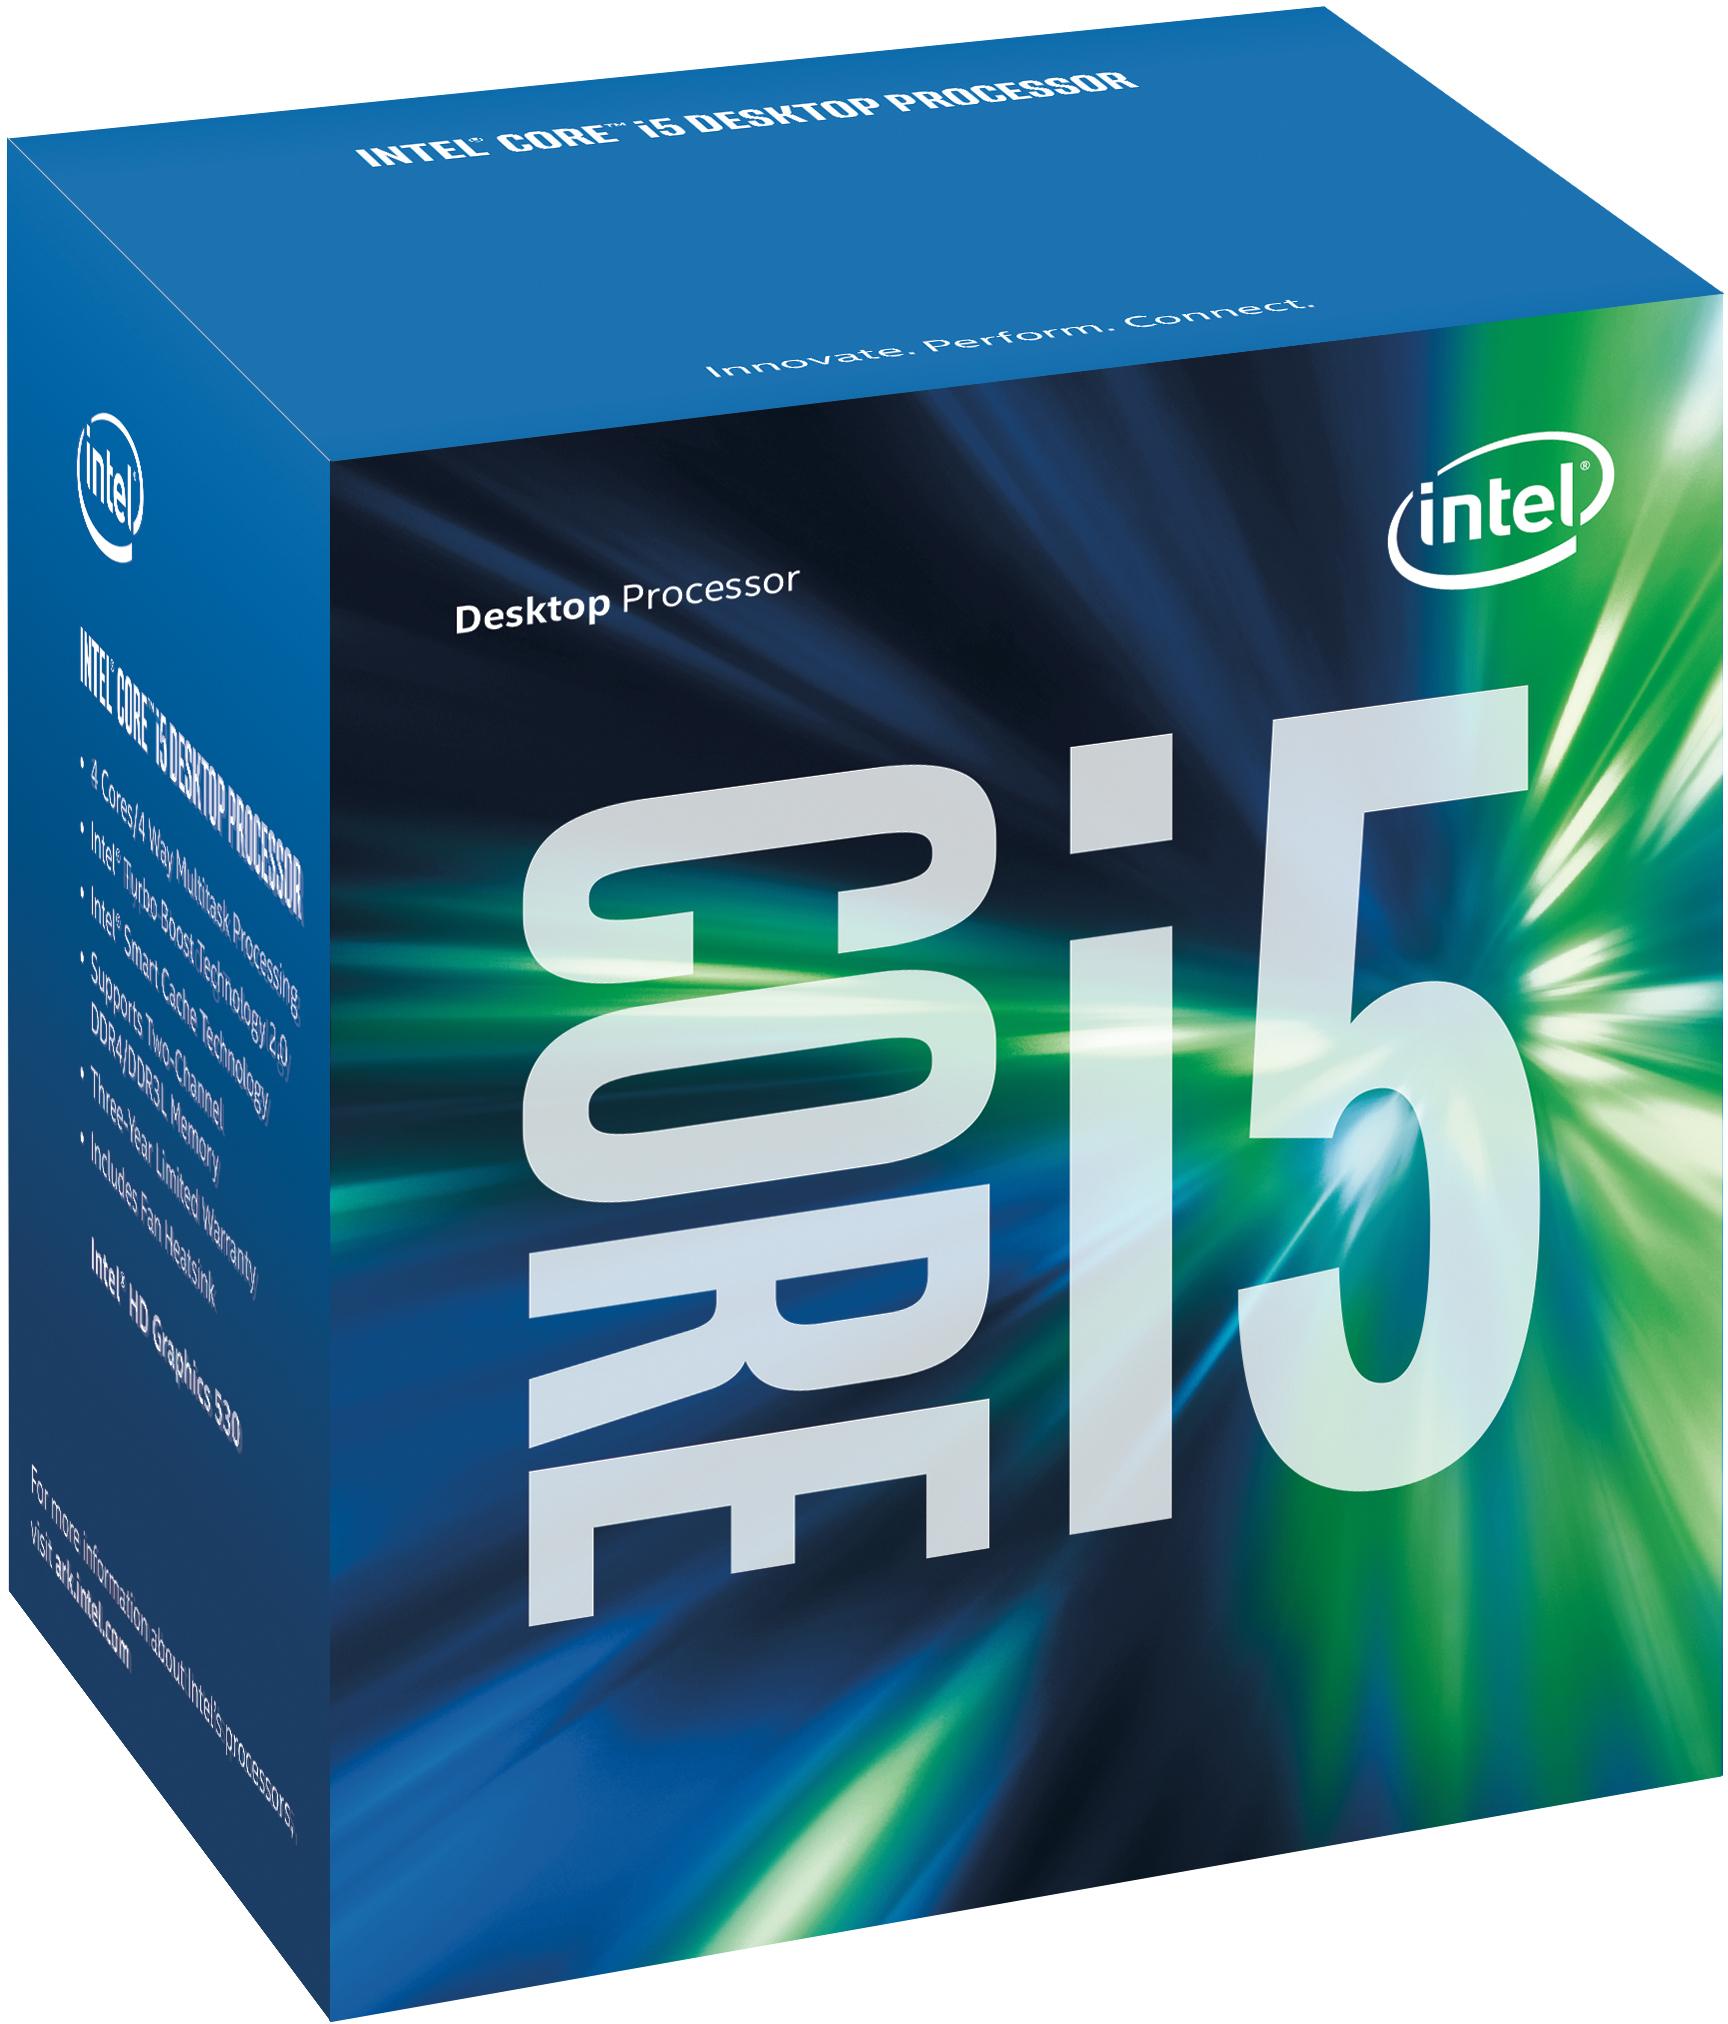 Intel Core i5-6500 @ 3.20 GHz